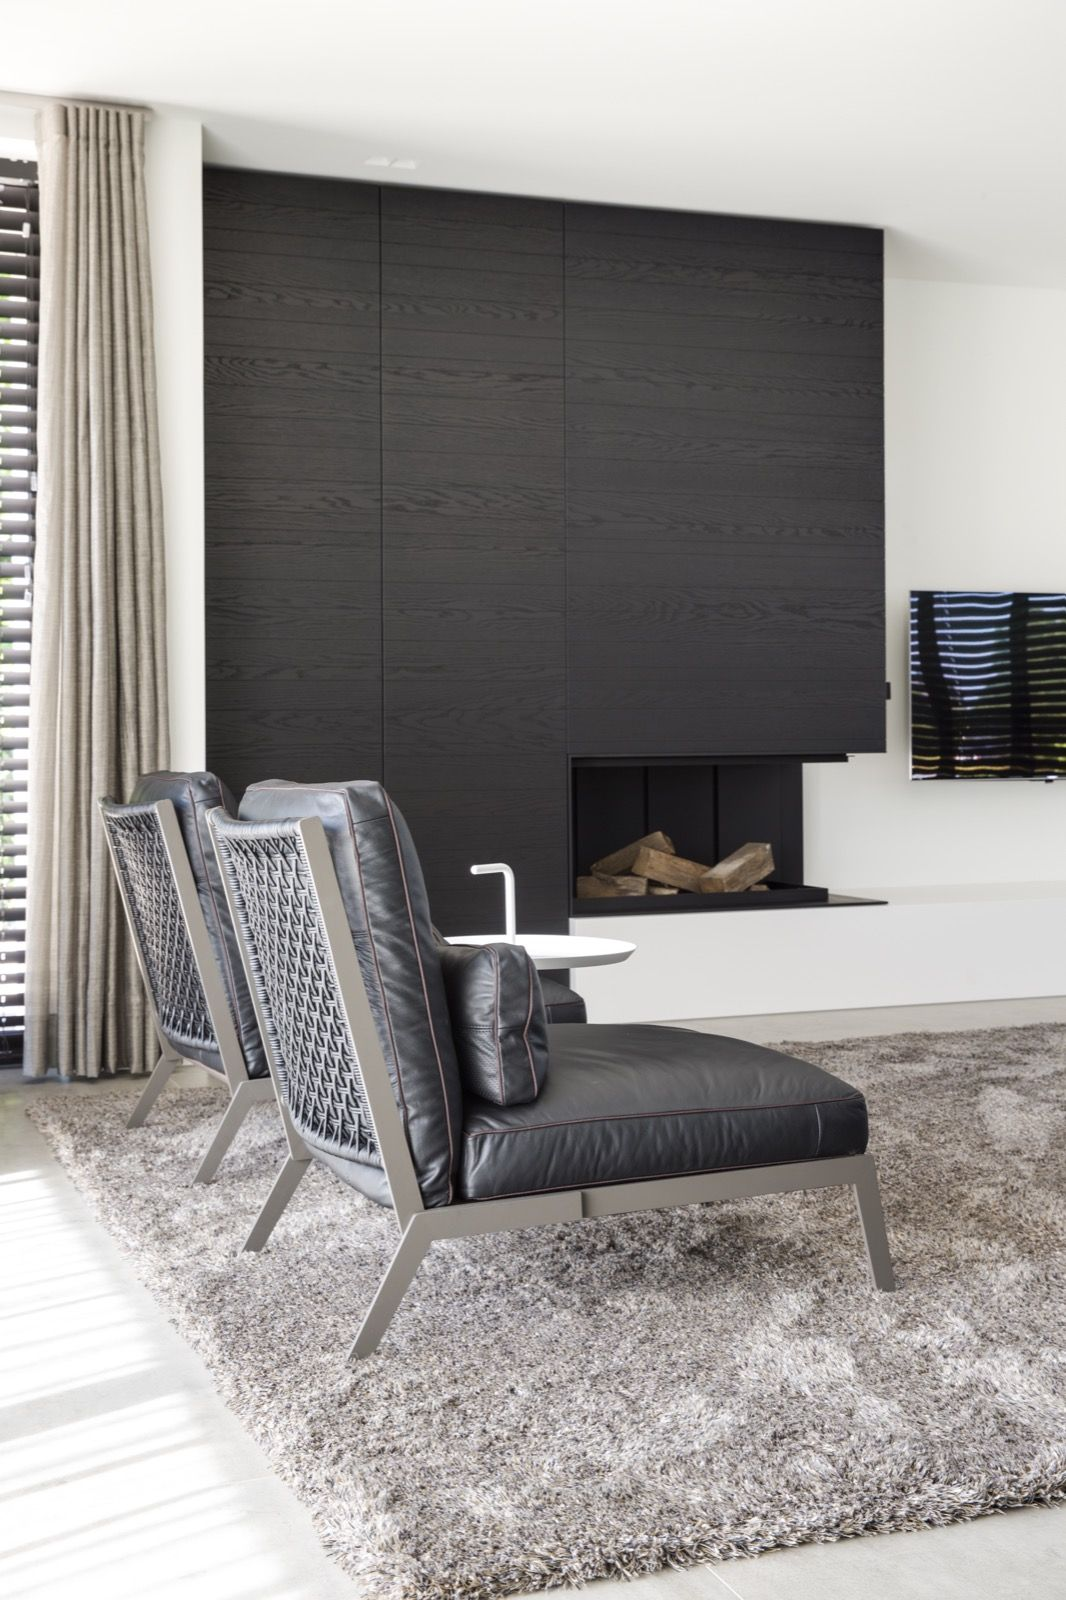 Interieurarchitectuur woonkamer complete verbouwing en inrichting